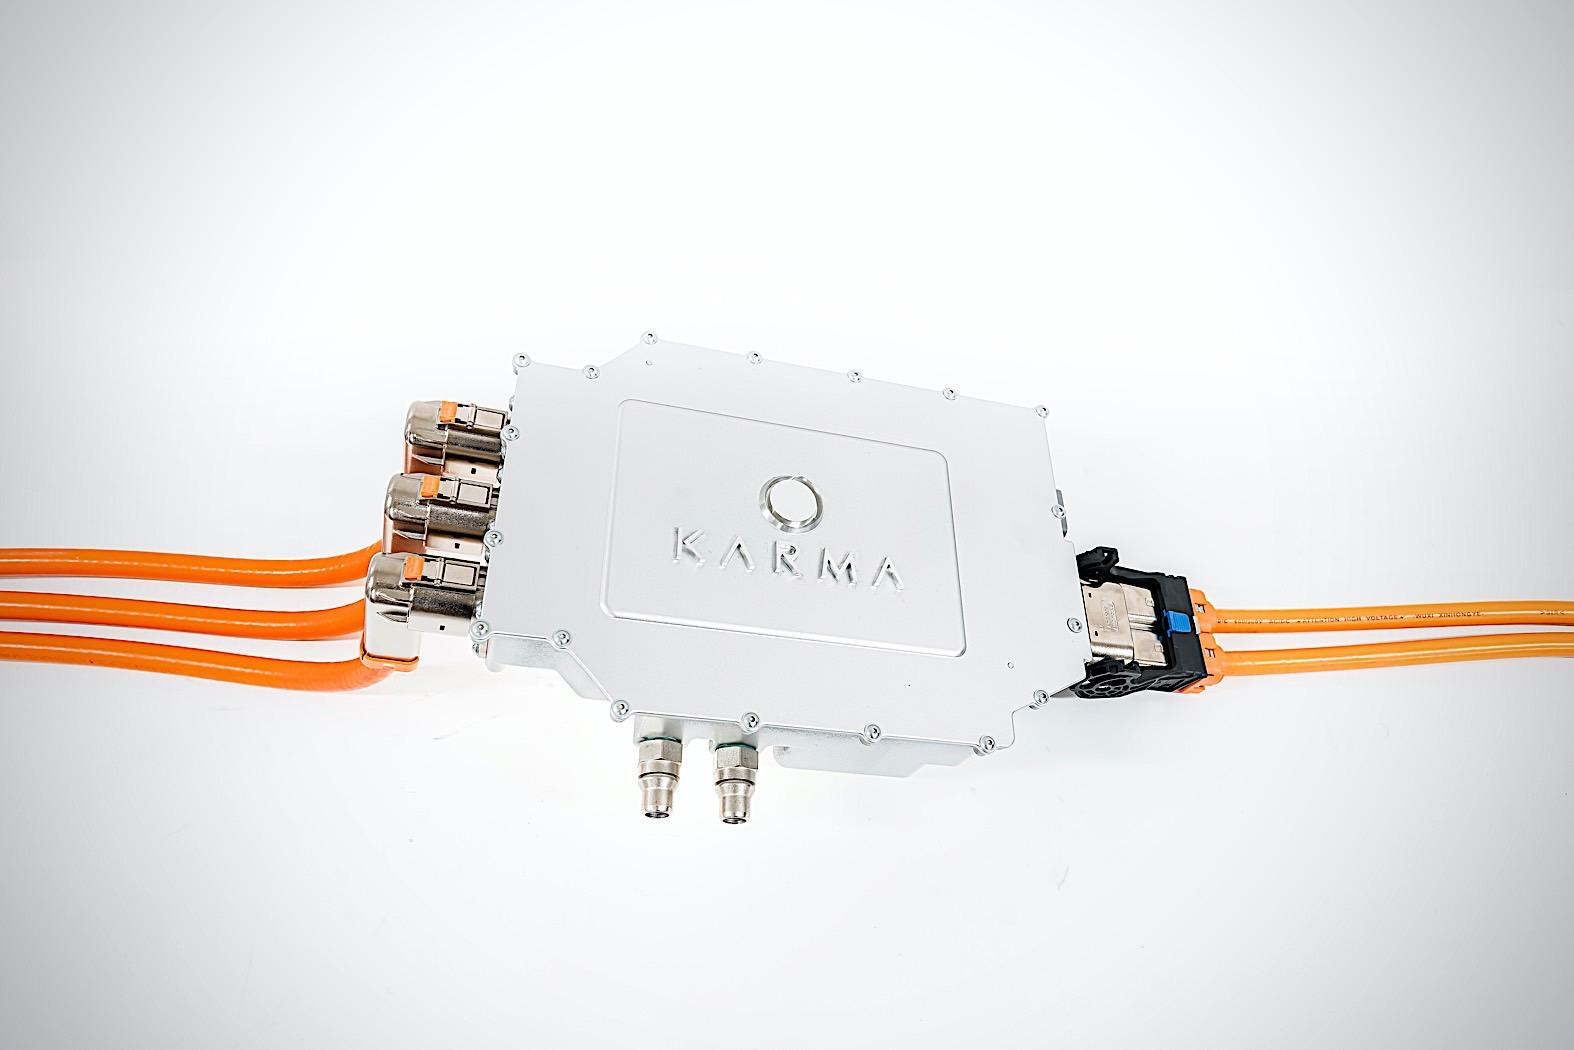 Karma Automotive Develops New Traction Inverter to Enhance EV Charging